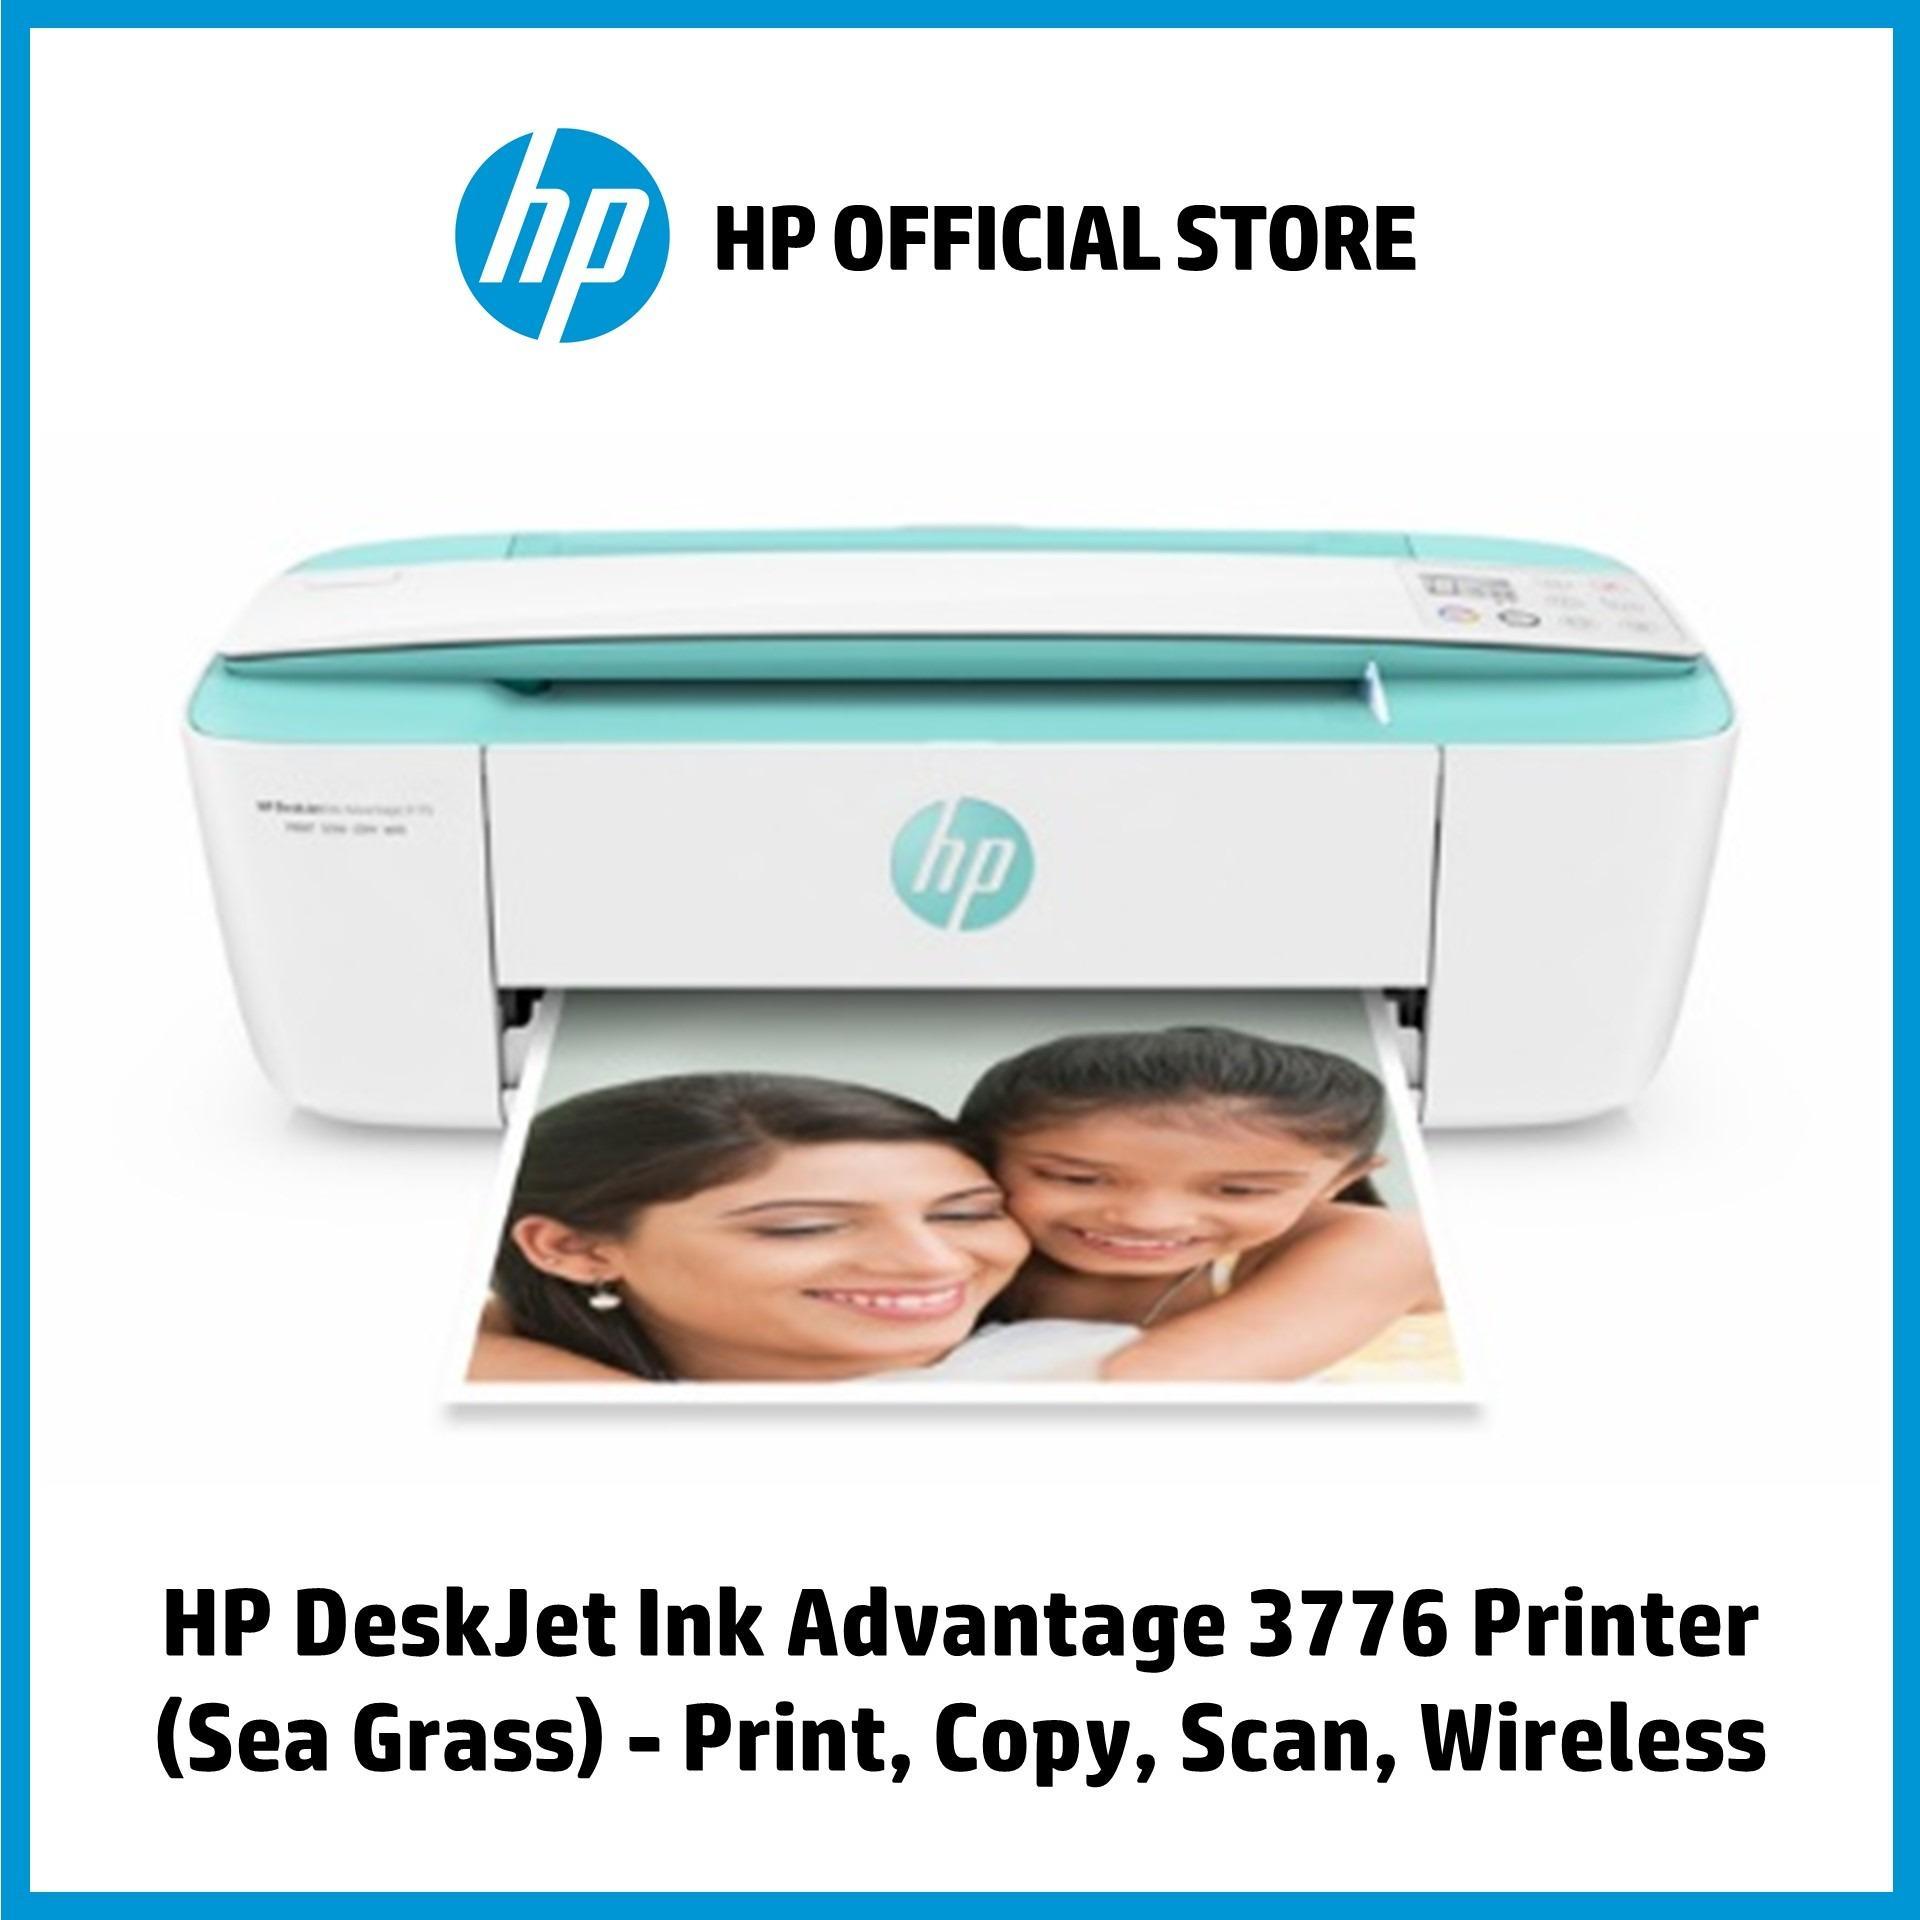 HP DeskJet Ink Advantage 3776 Printer (Sea Grass) - Print, Copy, Scan,  Wireless